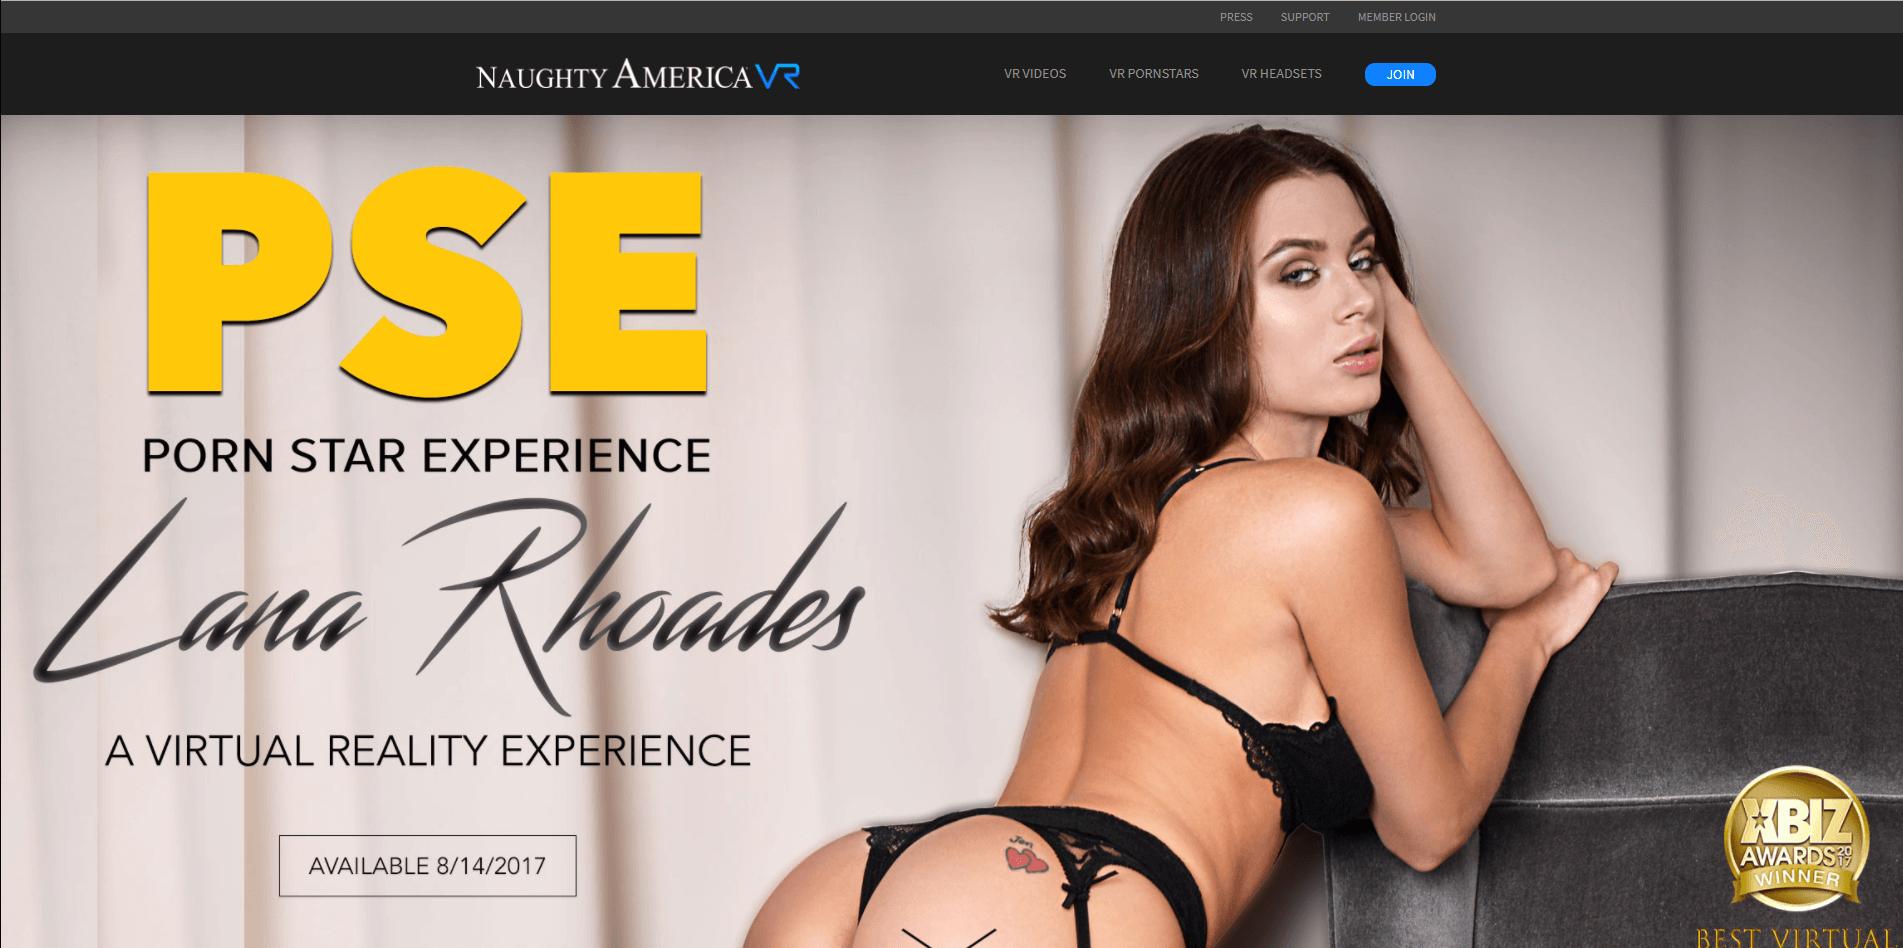 Naughty America VR Landing Page